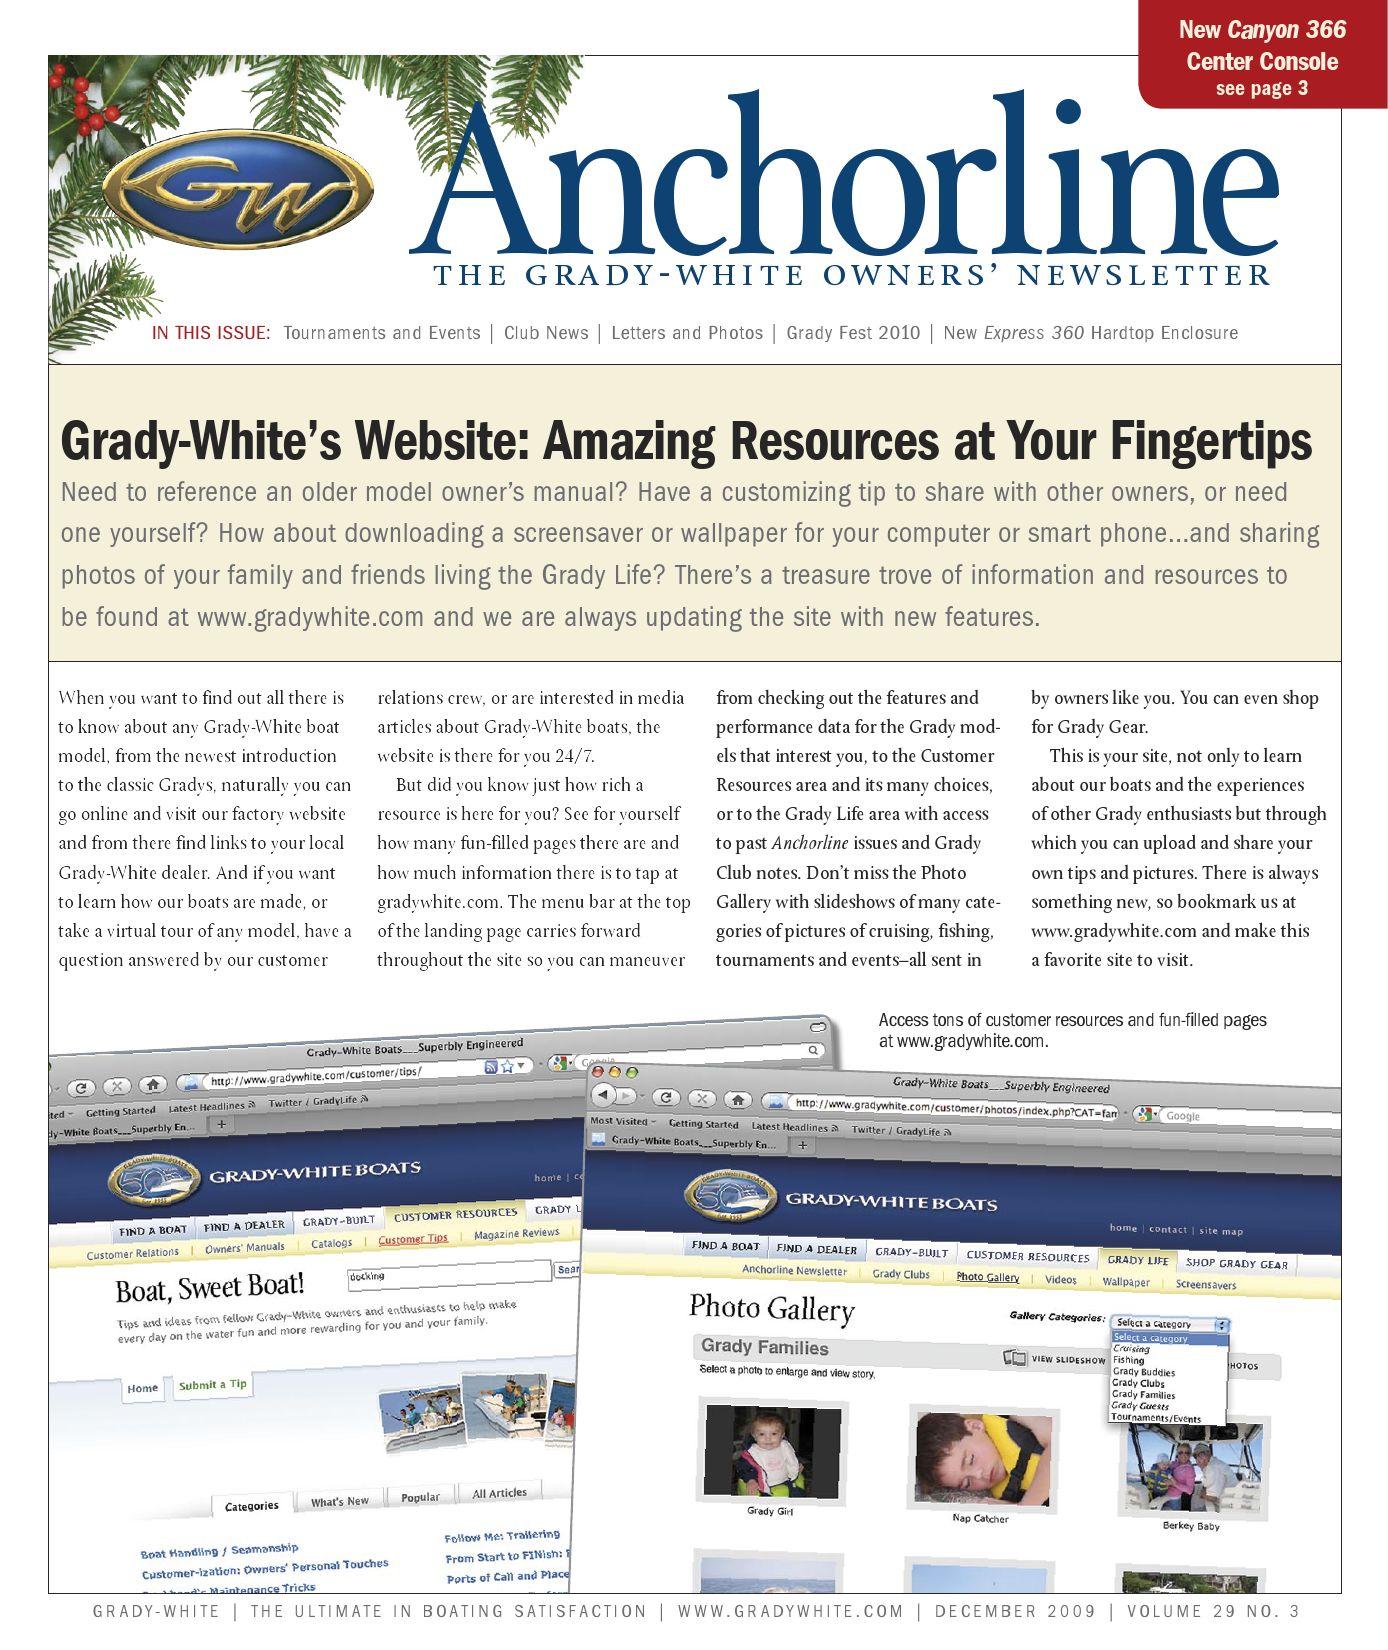 Grady-White Boats December 2009 Anchorline (vol  29 no  3) by Grady